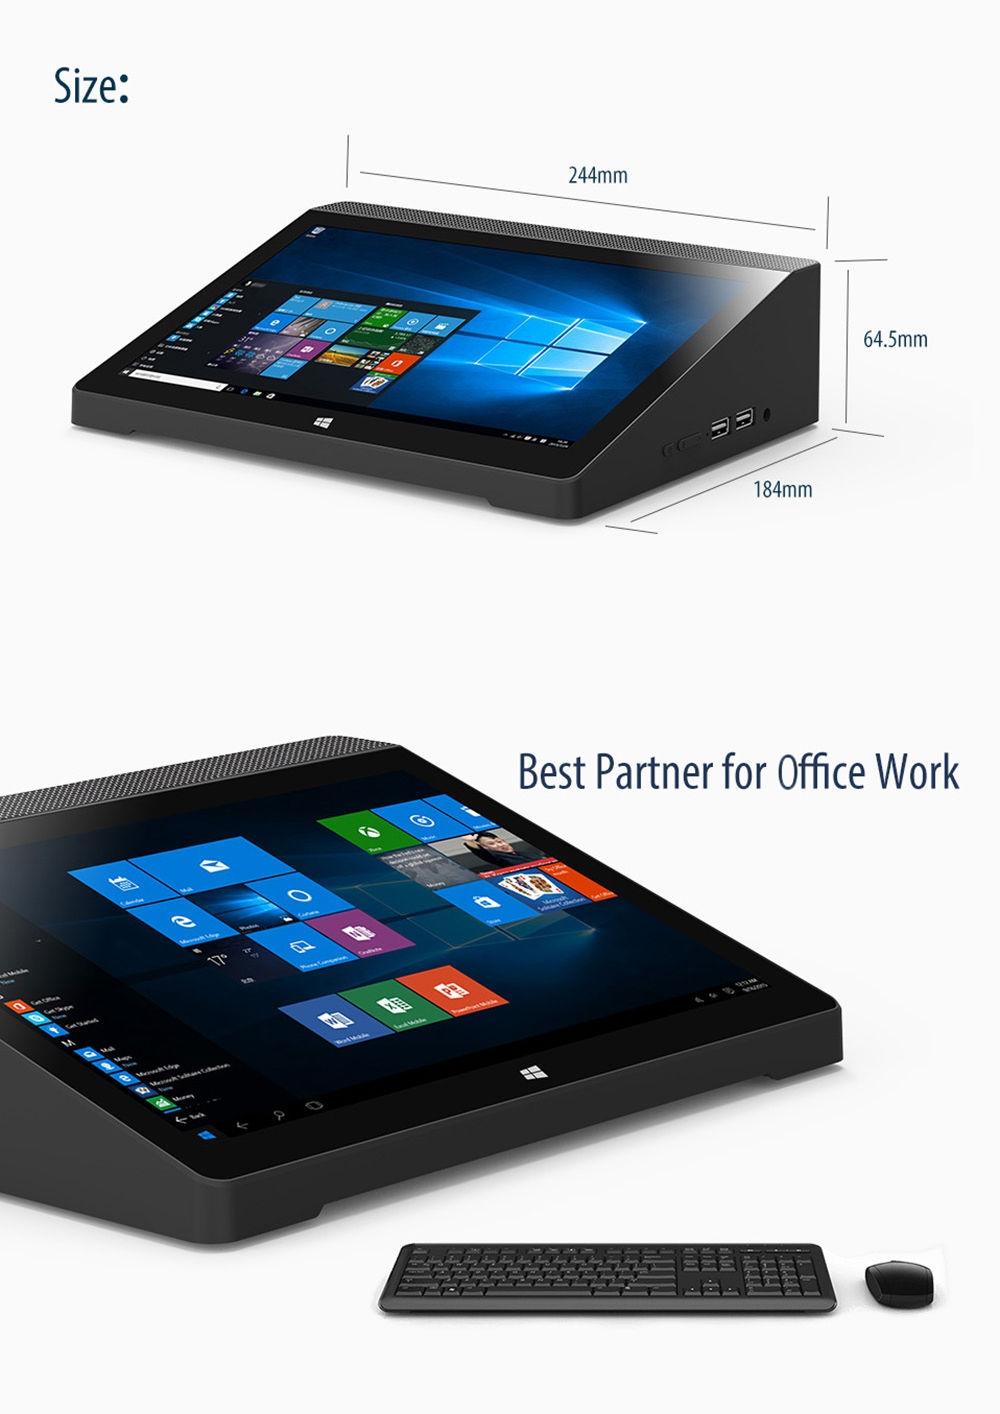 HIGOLE GOLE10 Mini PC Intel Atom X5-Z8350 CPU Windows 10 OS BT 4.0